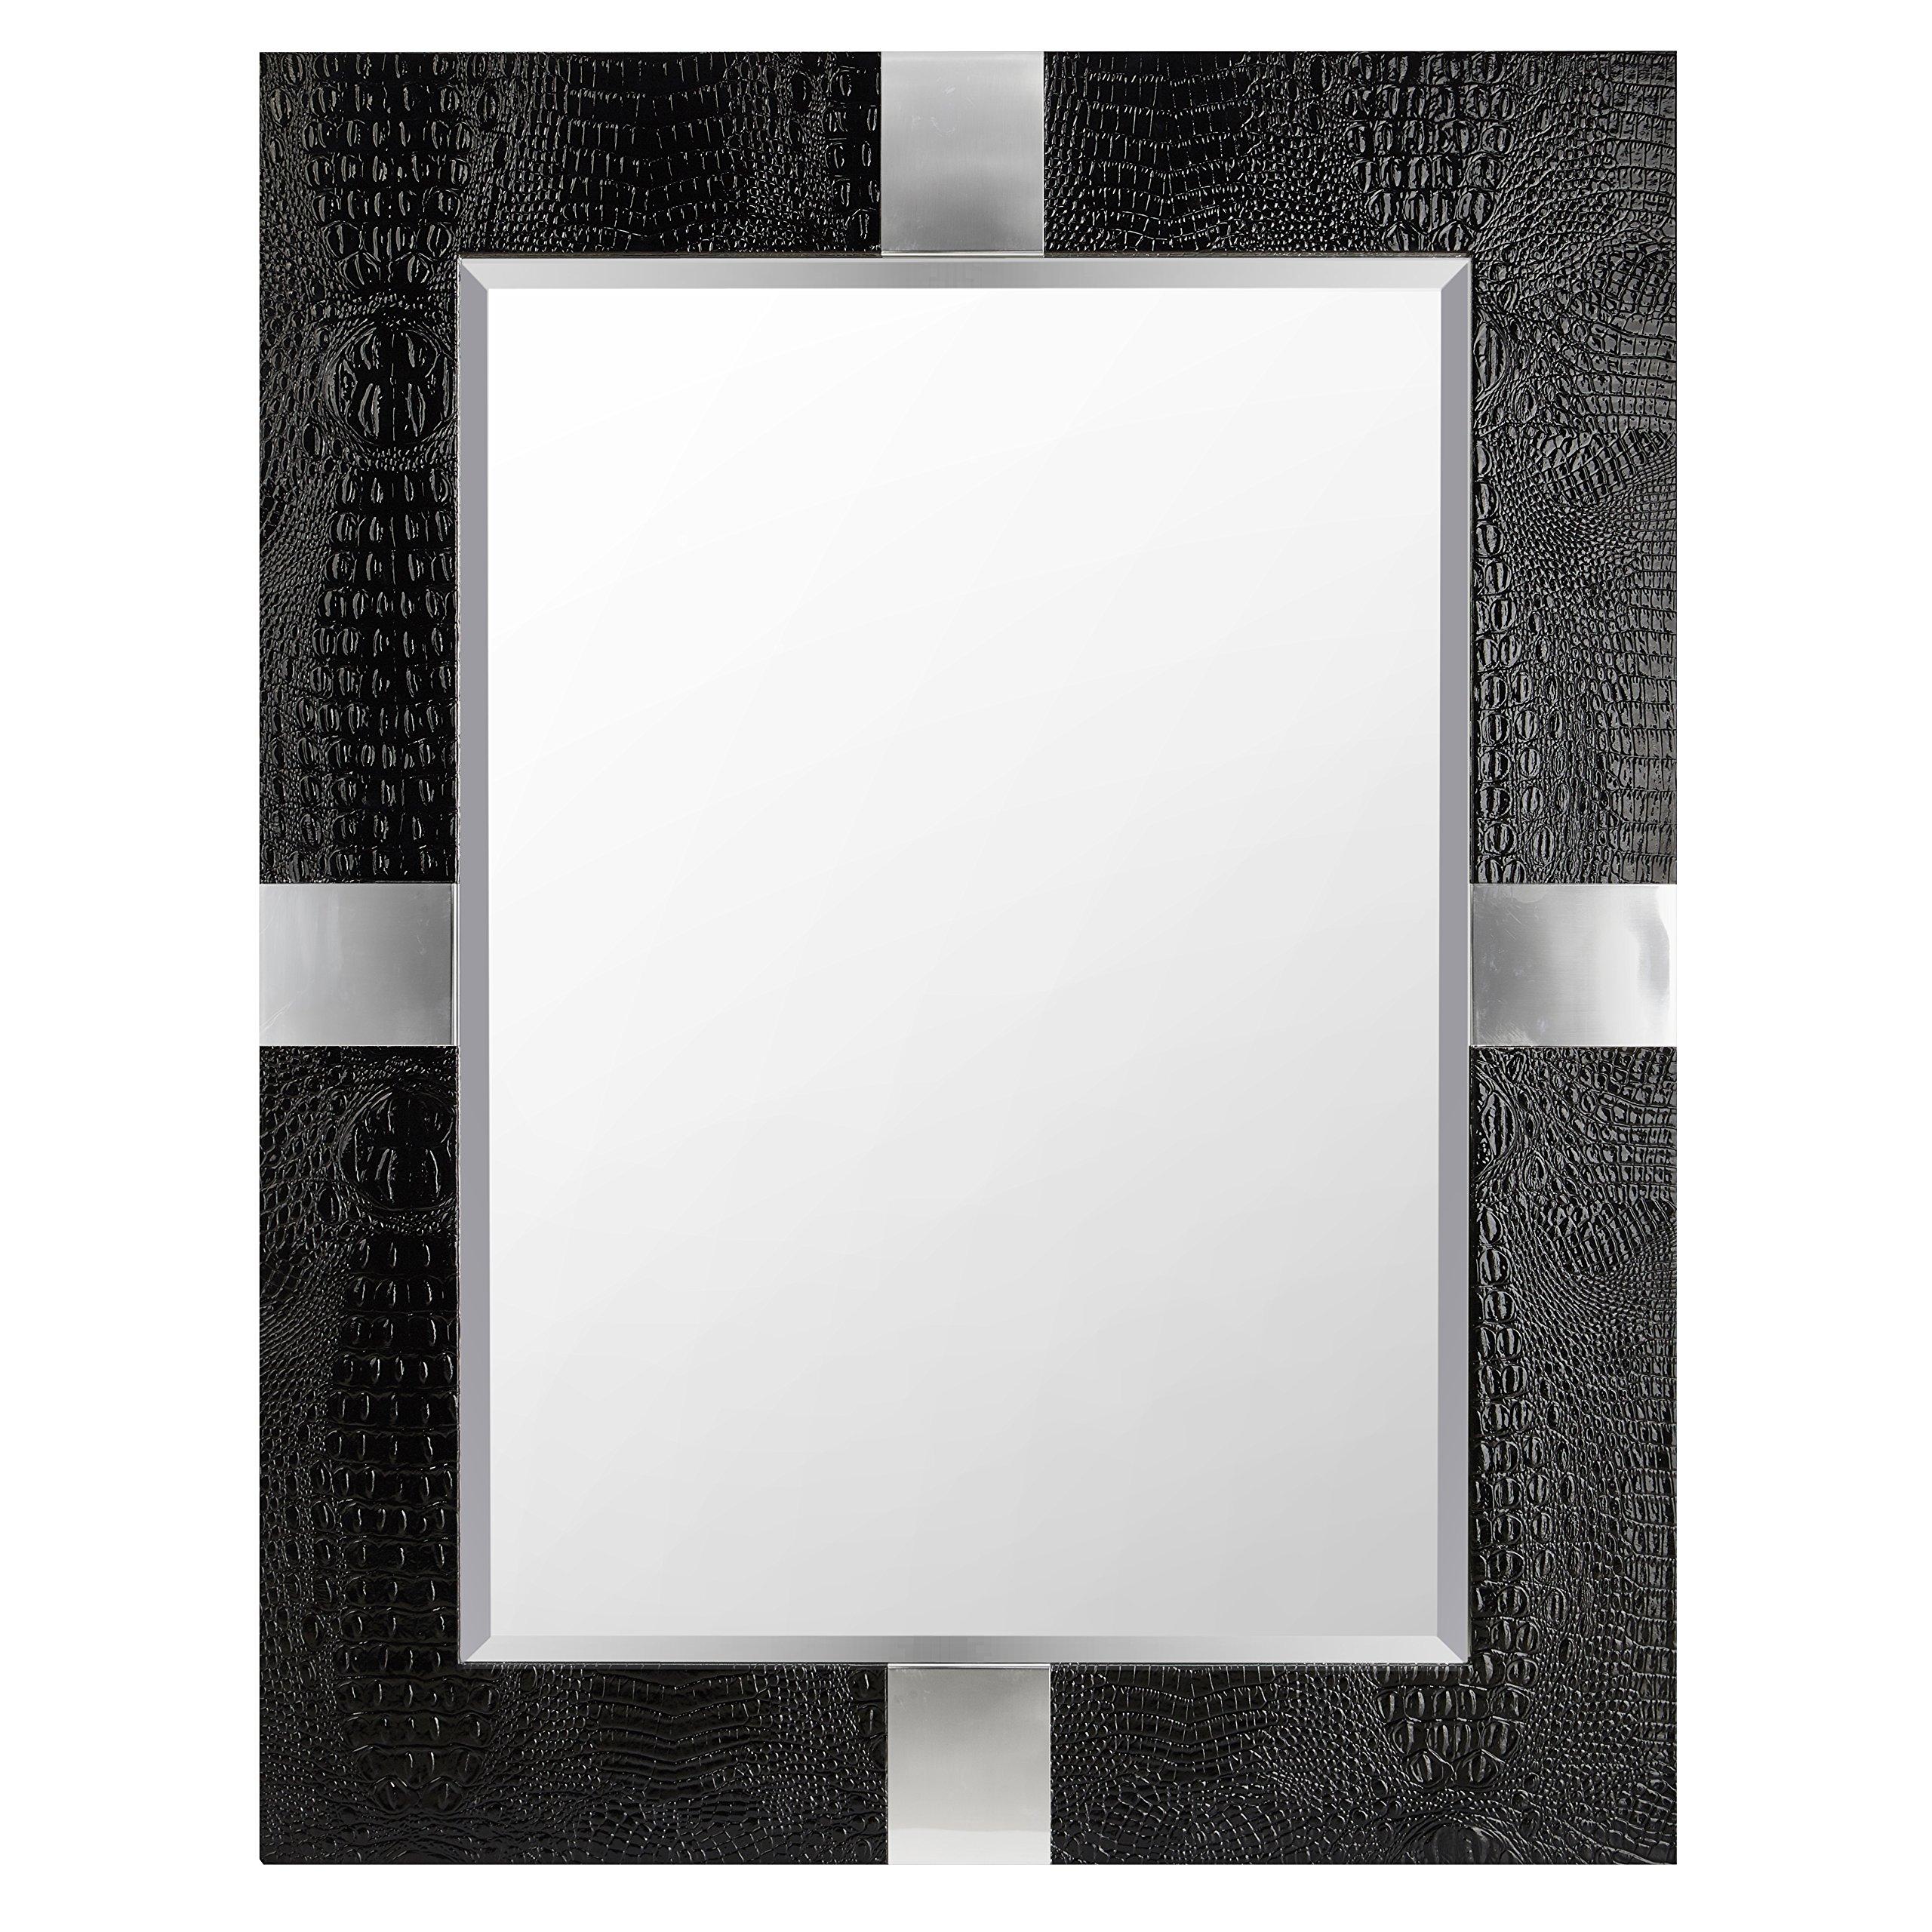 Impressive Animal Skin Patterned Faux Leather Mirror, Black